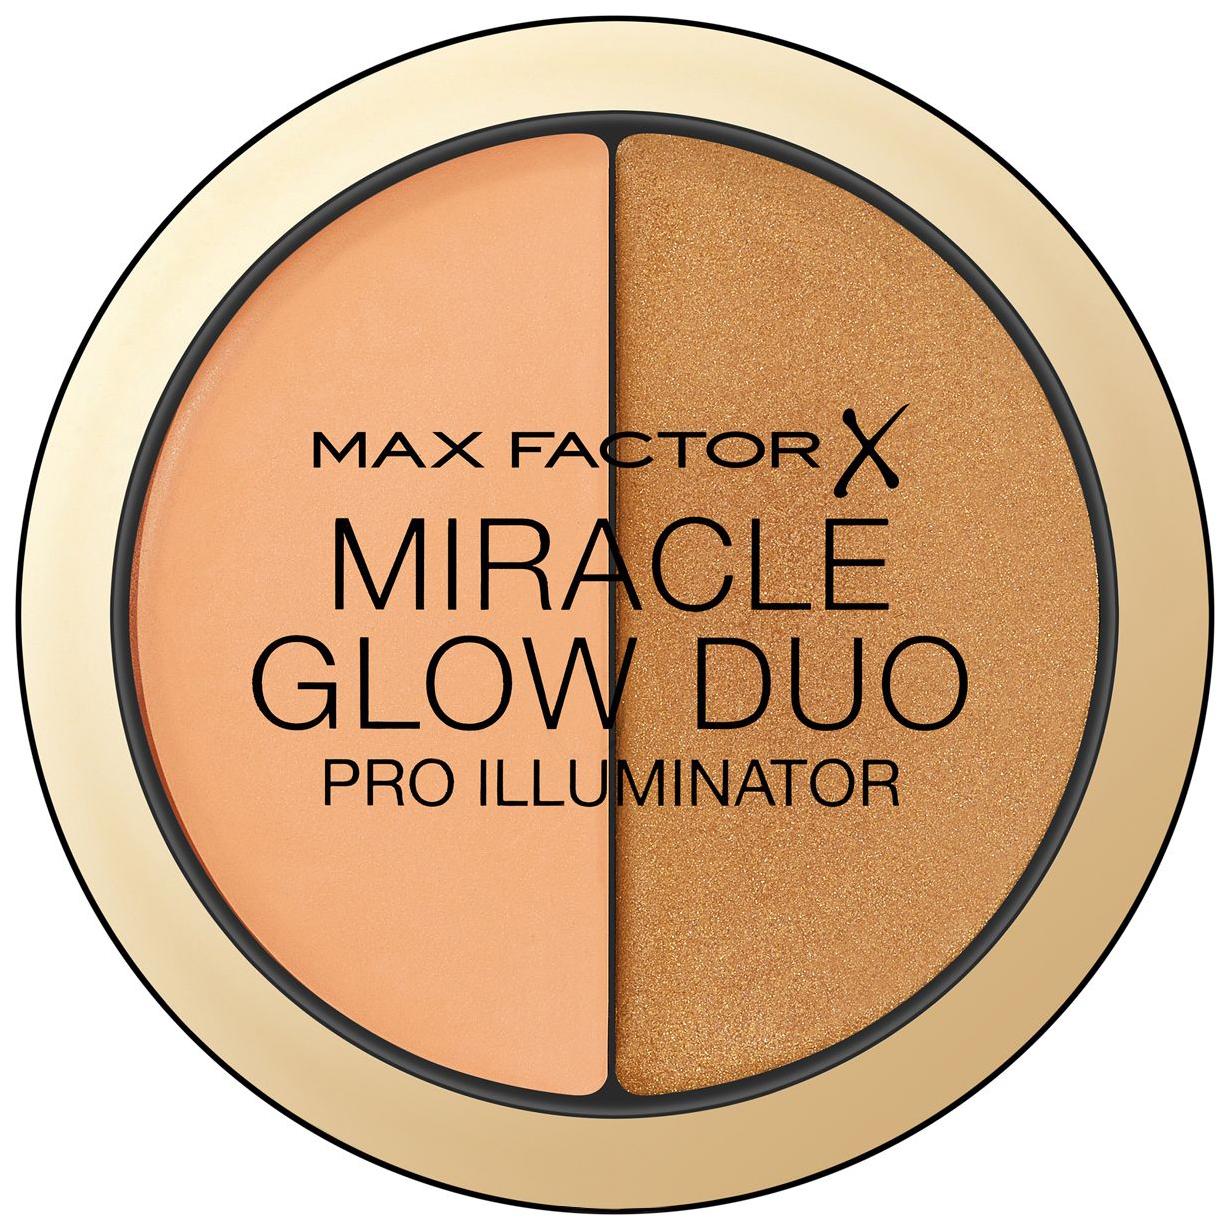 Хайлайтер Max Factor Miracle Glow Duo